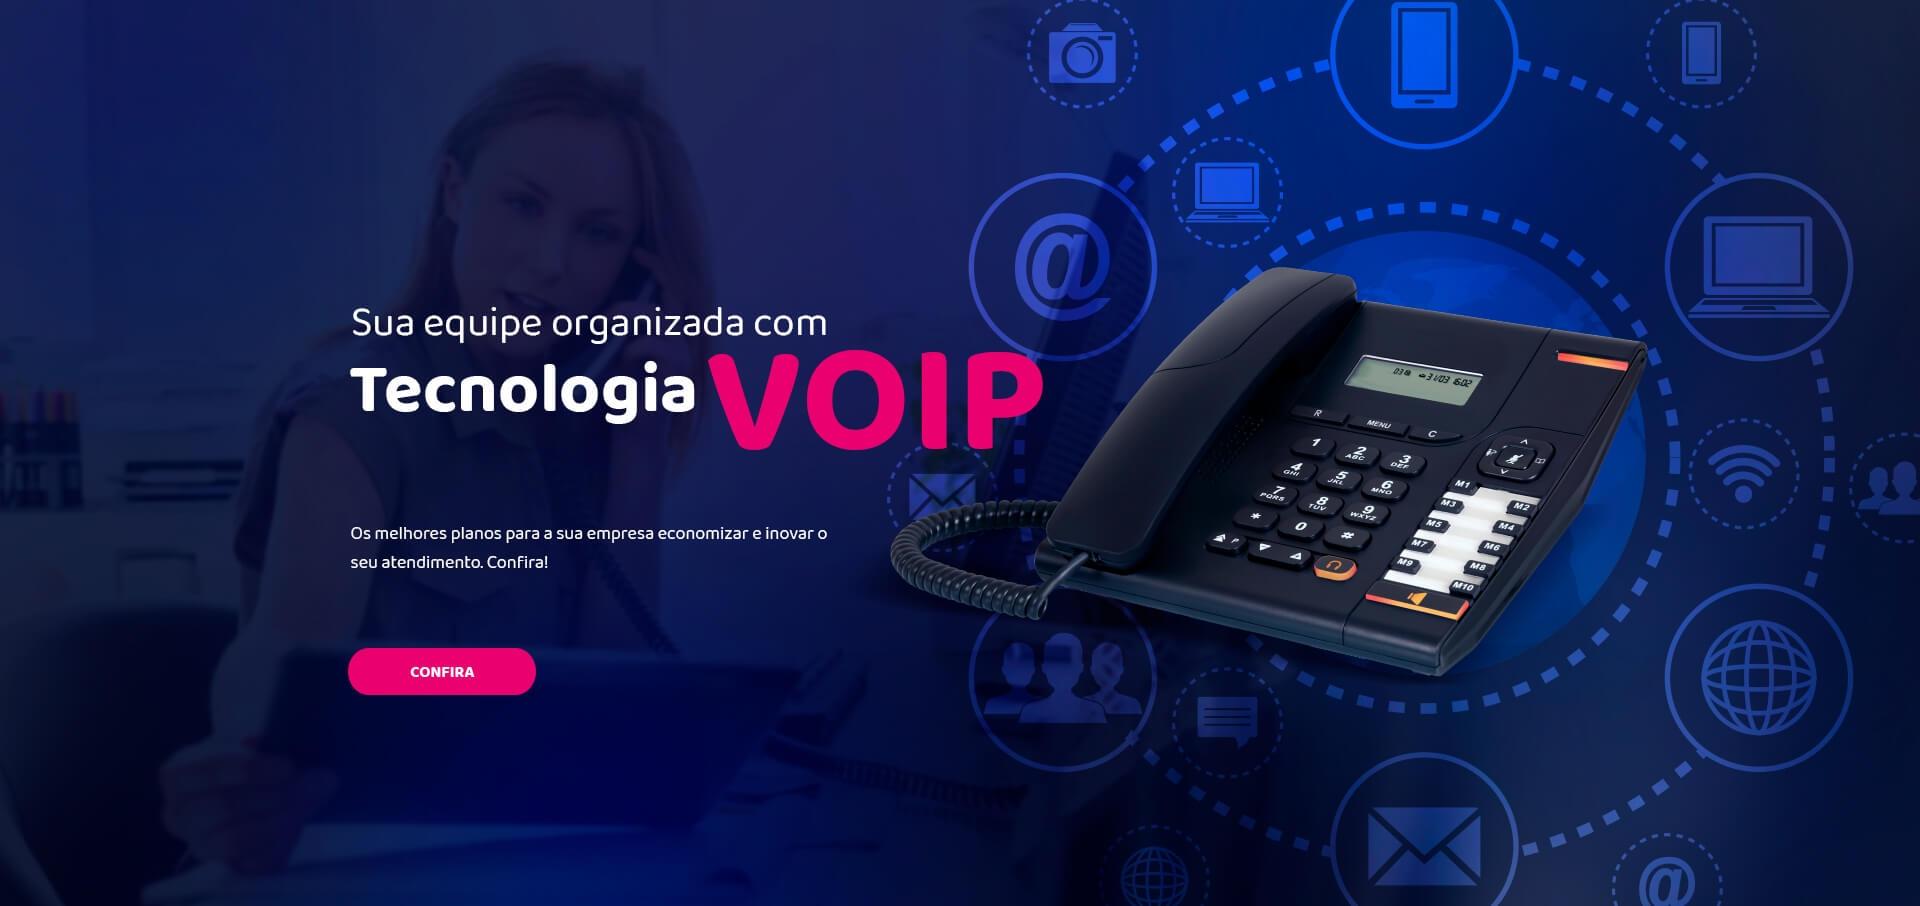 Tecnologia voip para a sua empresa